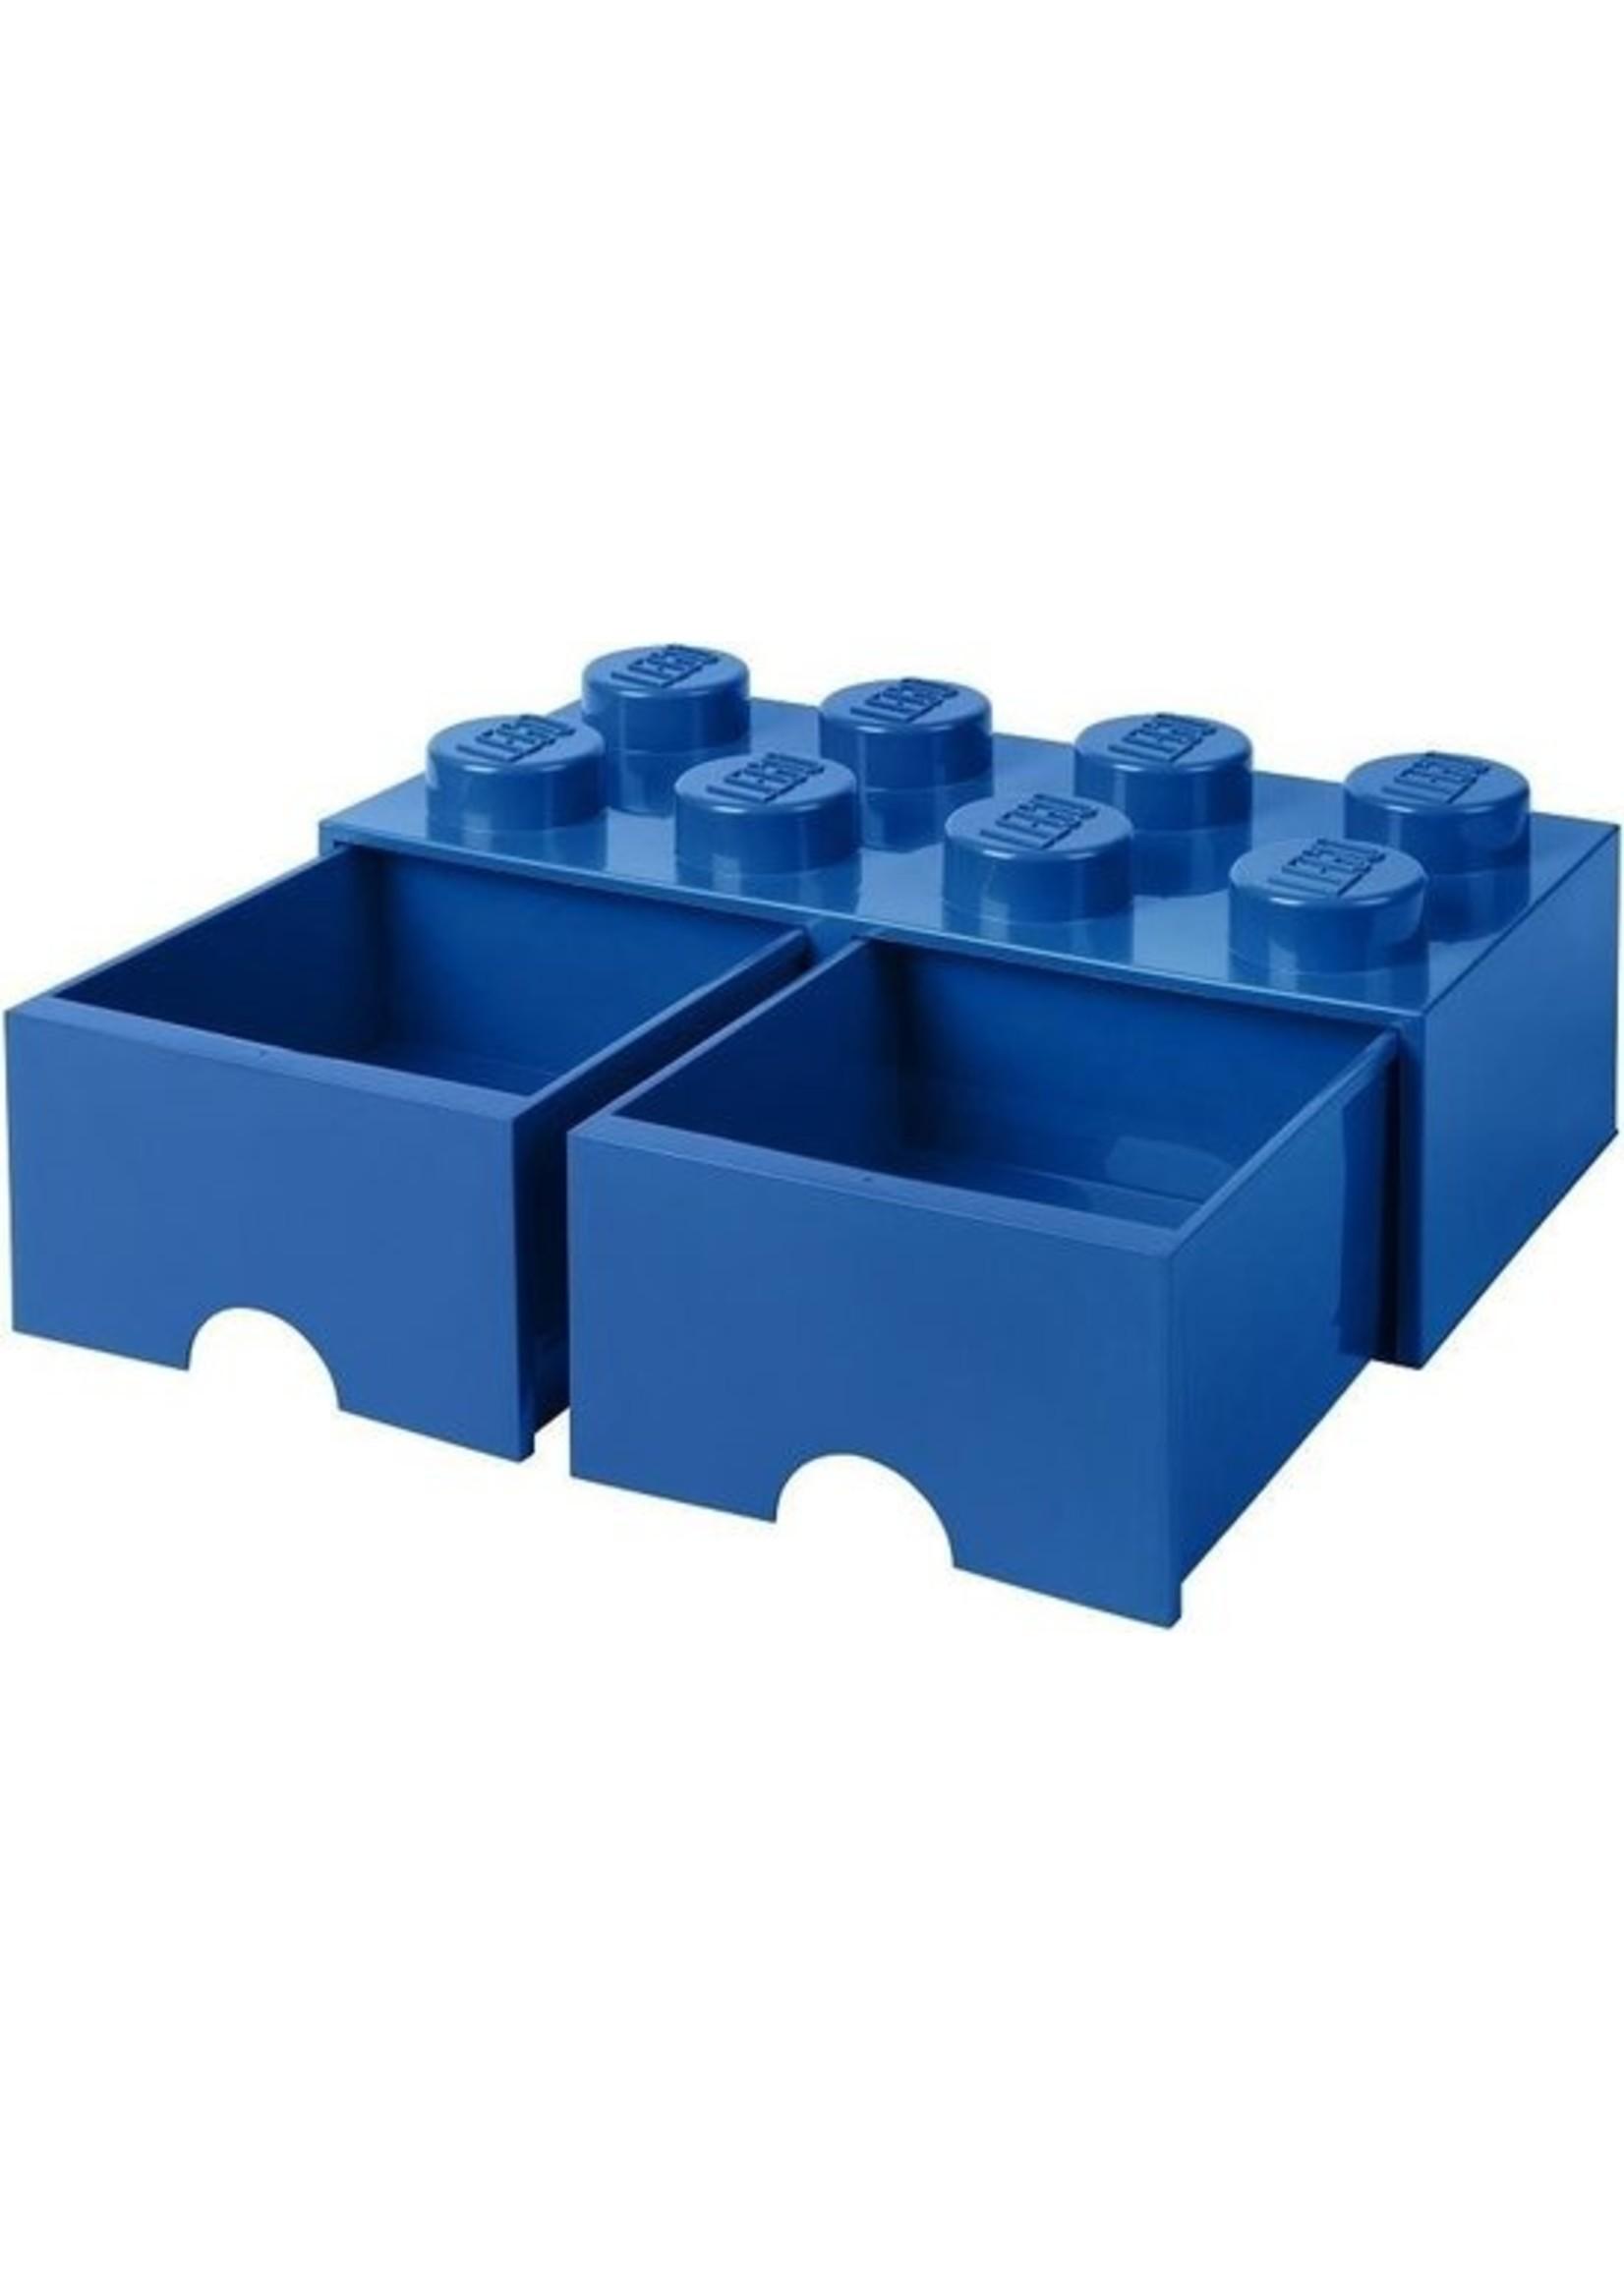 Lego LEGO 4004 Storage Brick Opbergbox - Kunststof - Blauw